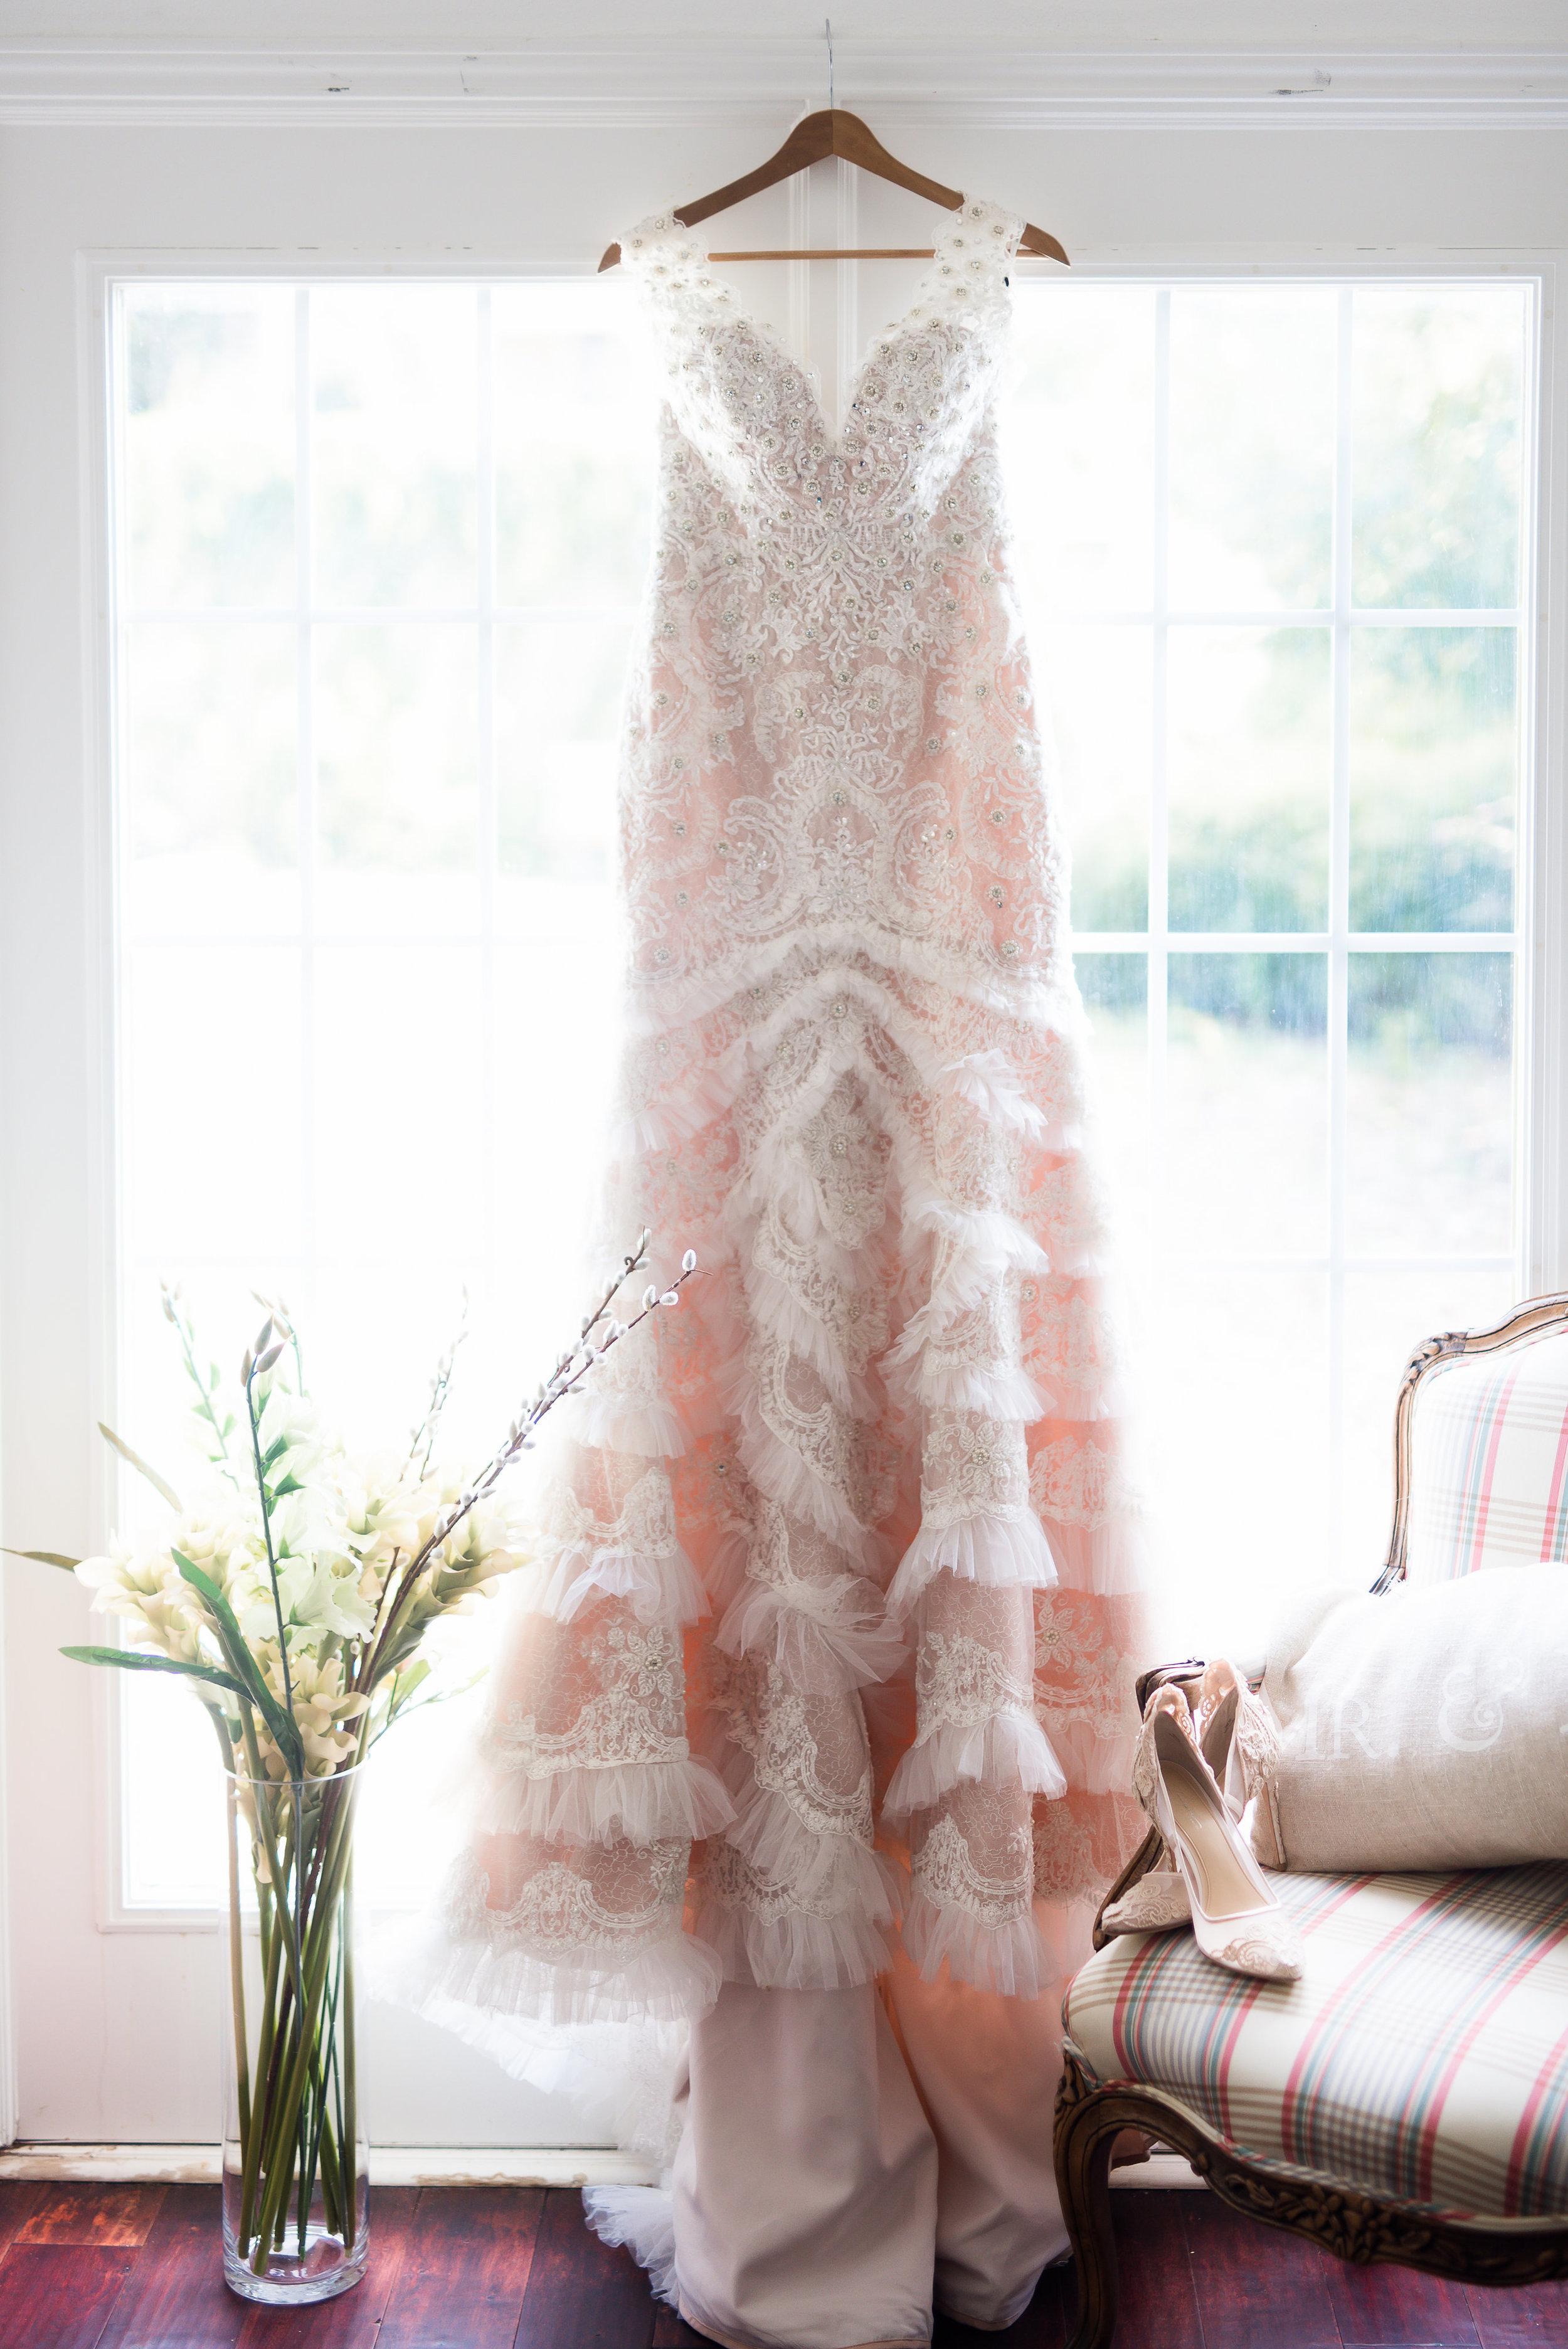 Richmond Wedding- Texas Wedding- Pharris Photography- Texas Photography- The Manor of Richmond- TC and Jessica= Lace Wedding Dress